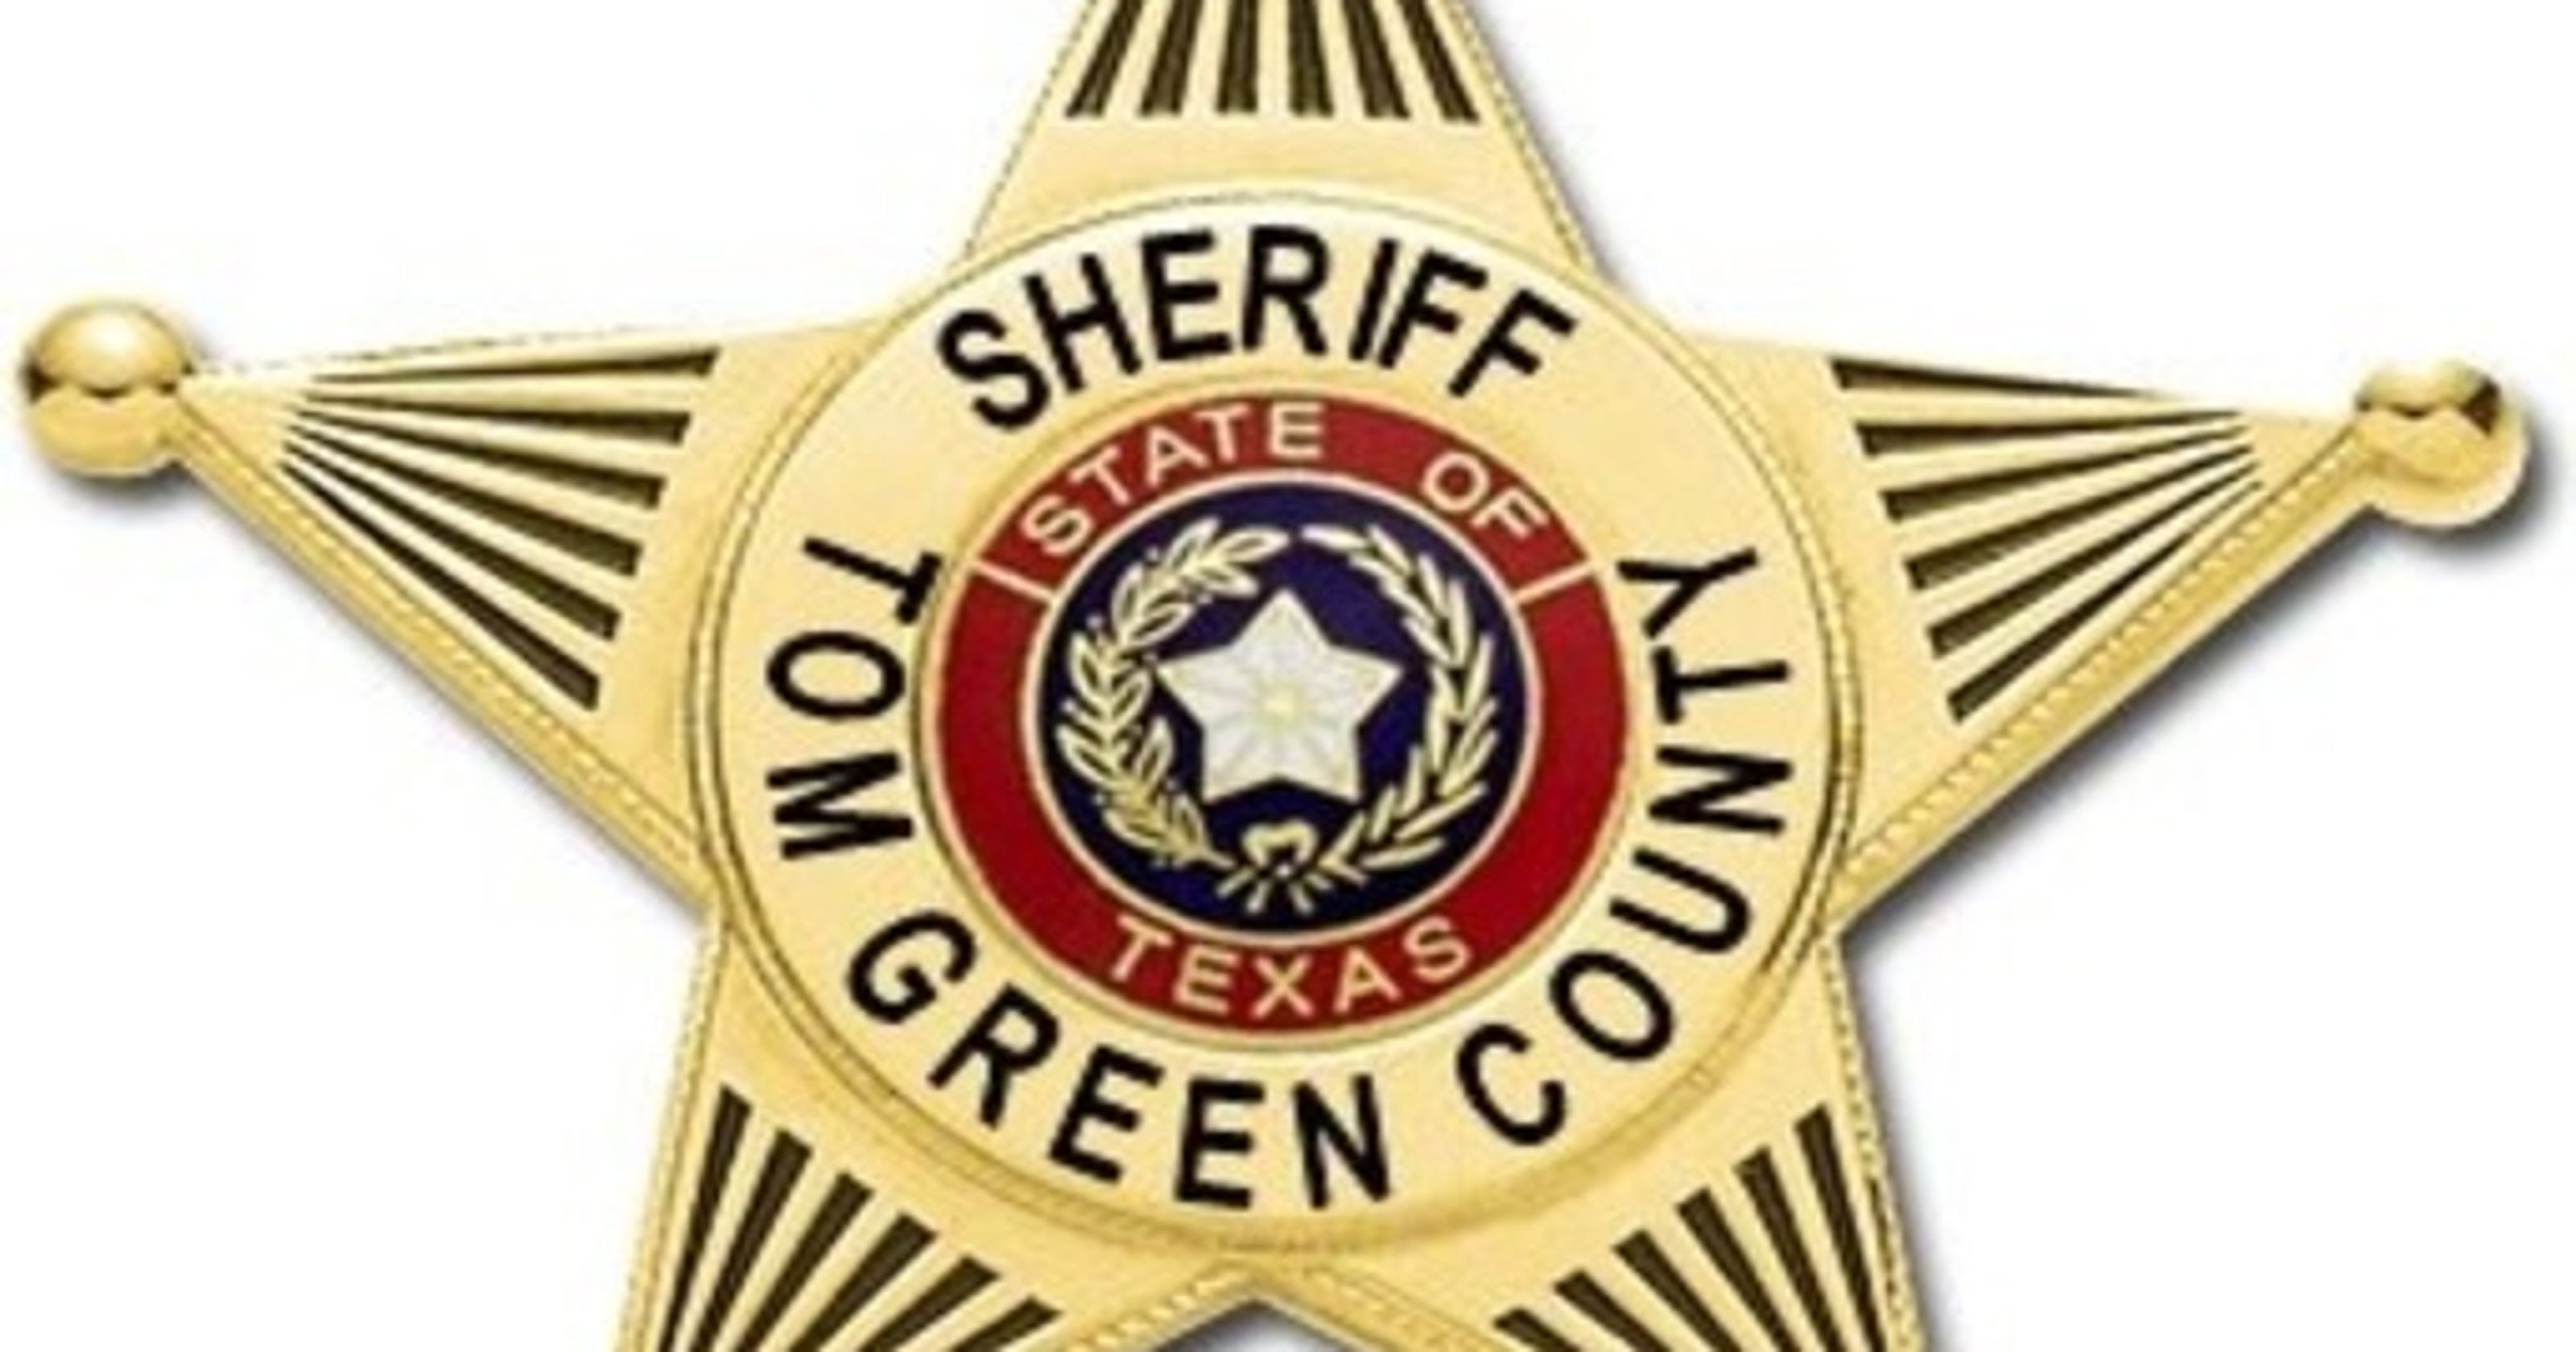 Sheriffs Office Received Money - Keshowazo